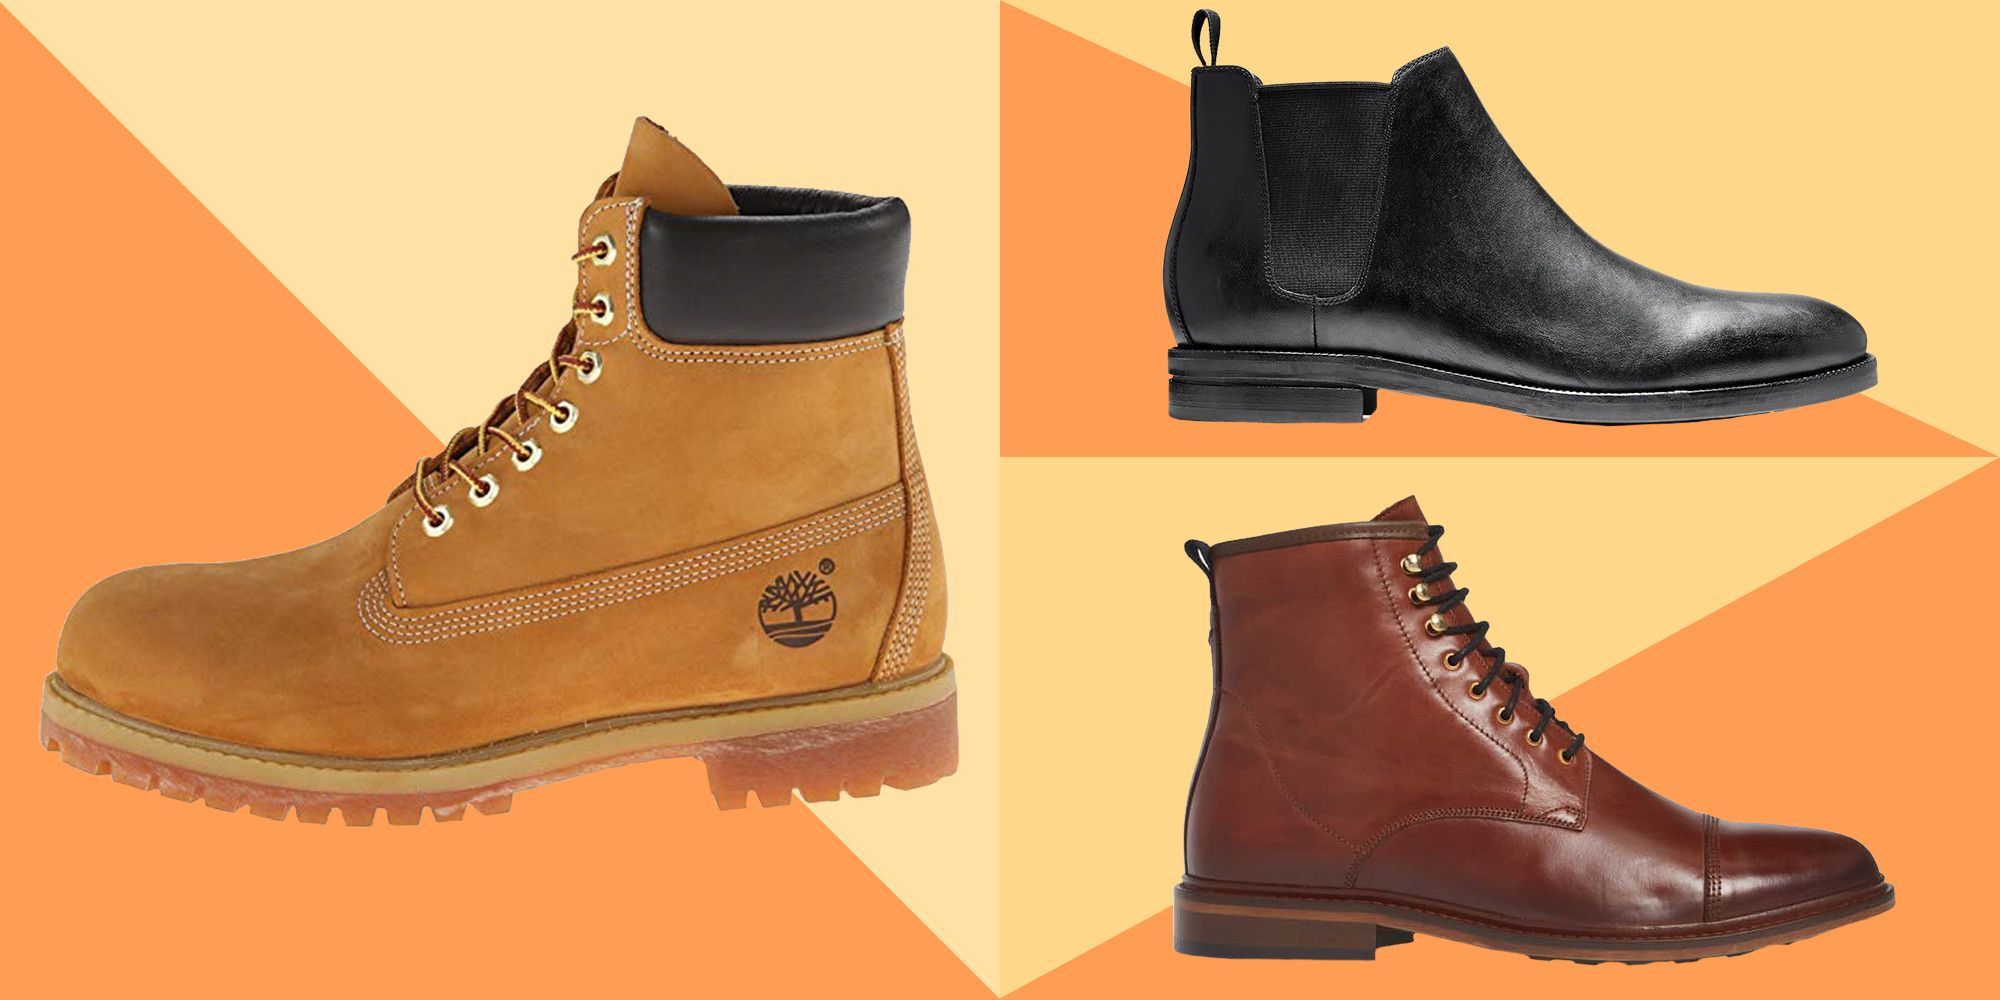 10 Best Men's Winter Boots 2020 Most Stylish Men's Winter